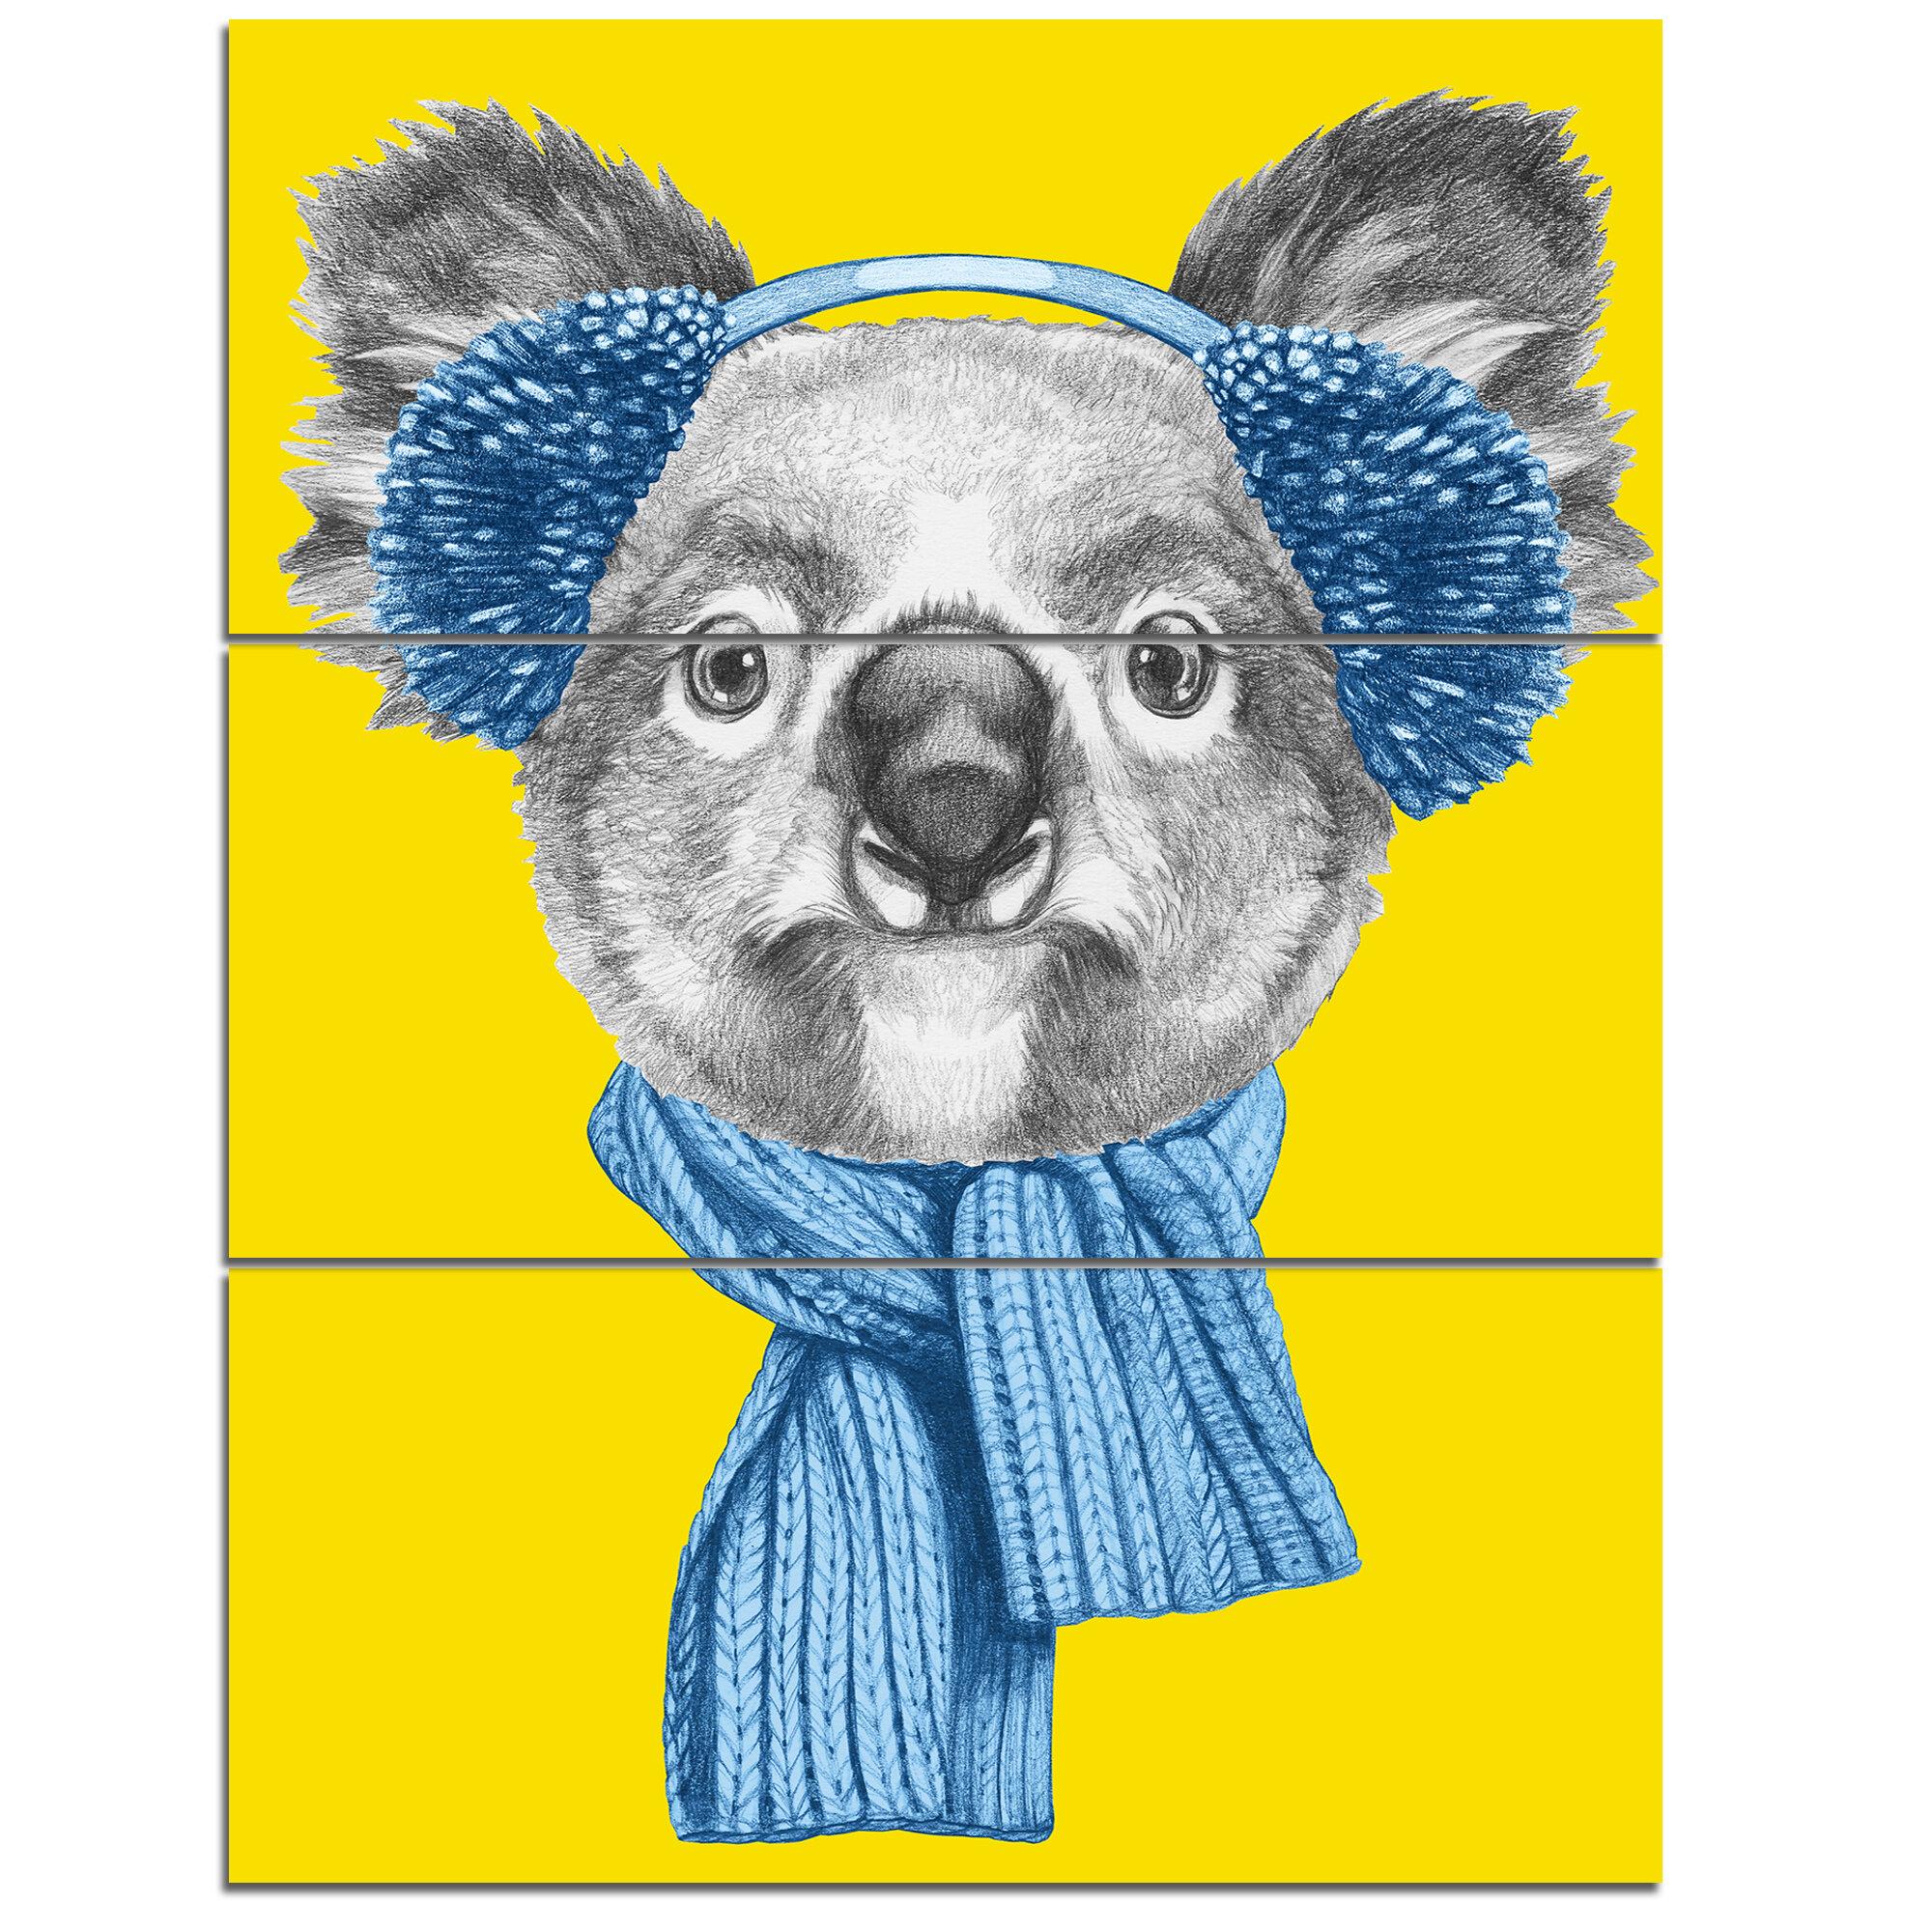 DesignArt \'Koala with Scarf and Earmuffs\' 3 Piece Wall Art on ...